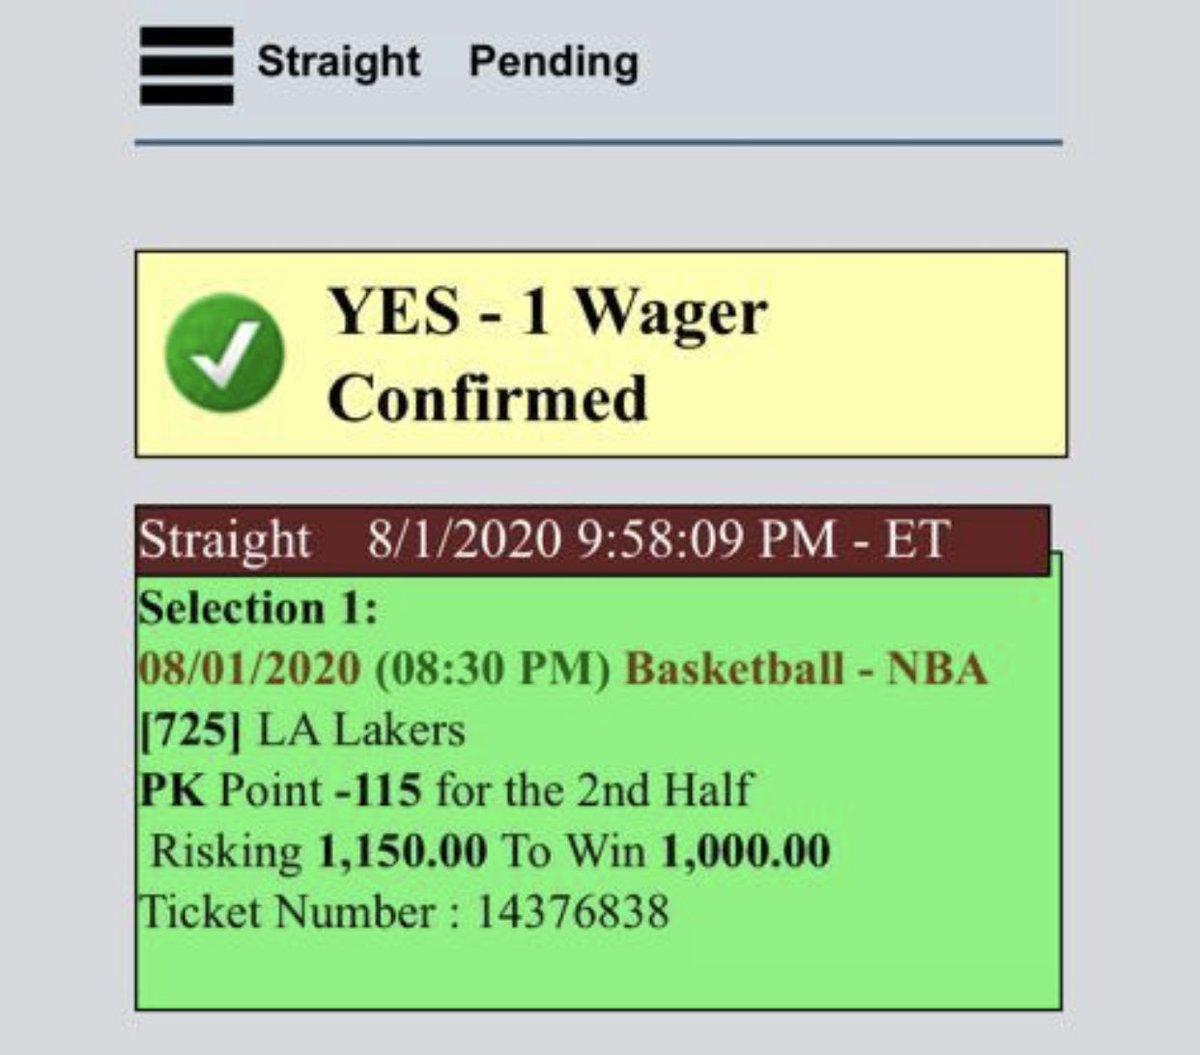 Final bet on the #lakers #LakersNation #Lakersvsraptorspic.twitter.com/sCzSkpo8L0